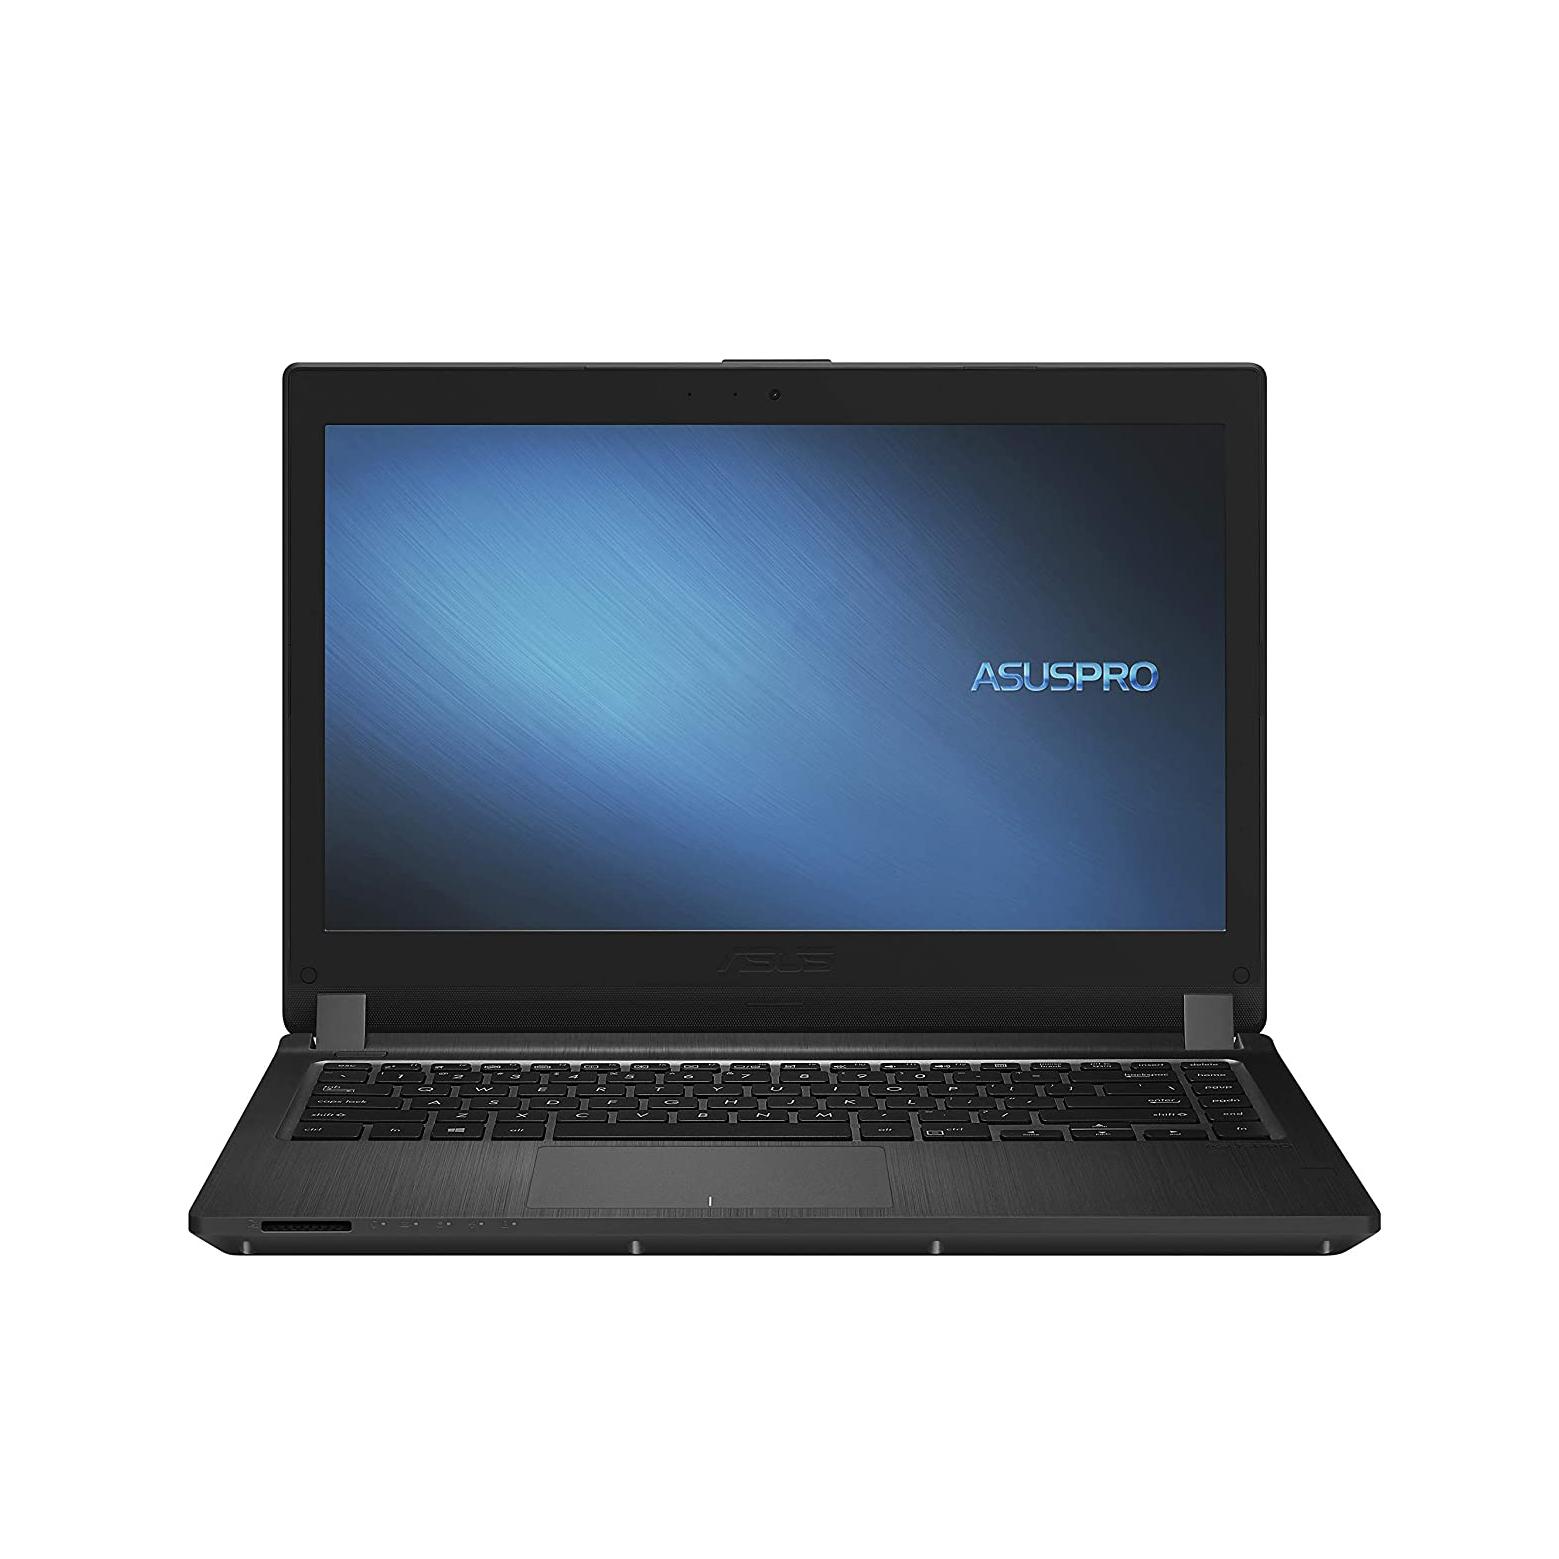 NOTEBOOK ASUS P1440FA-FQ2348 I3 10110U 2.1GHz 4M 4G 1T VGA INTEL HD 14.0 BLACK ,Laptop Pc